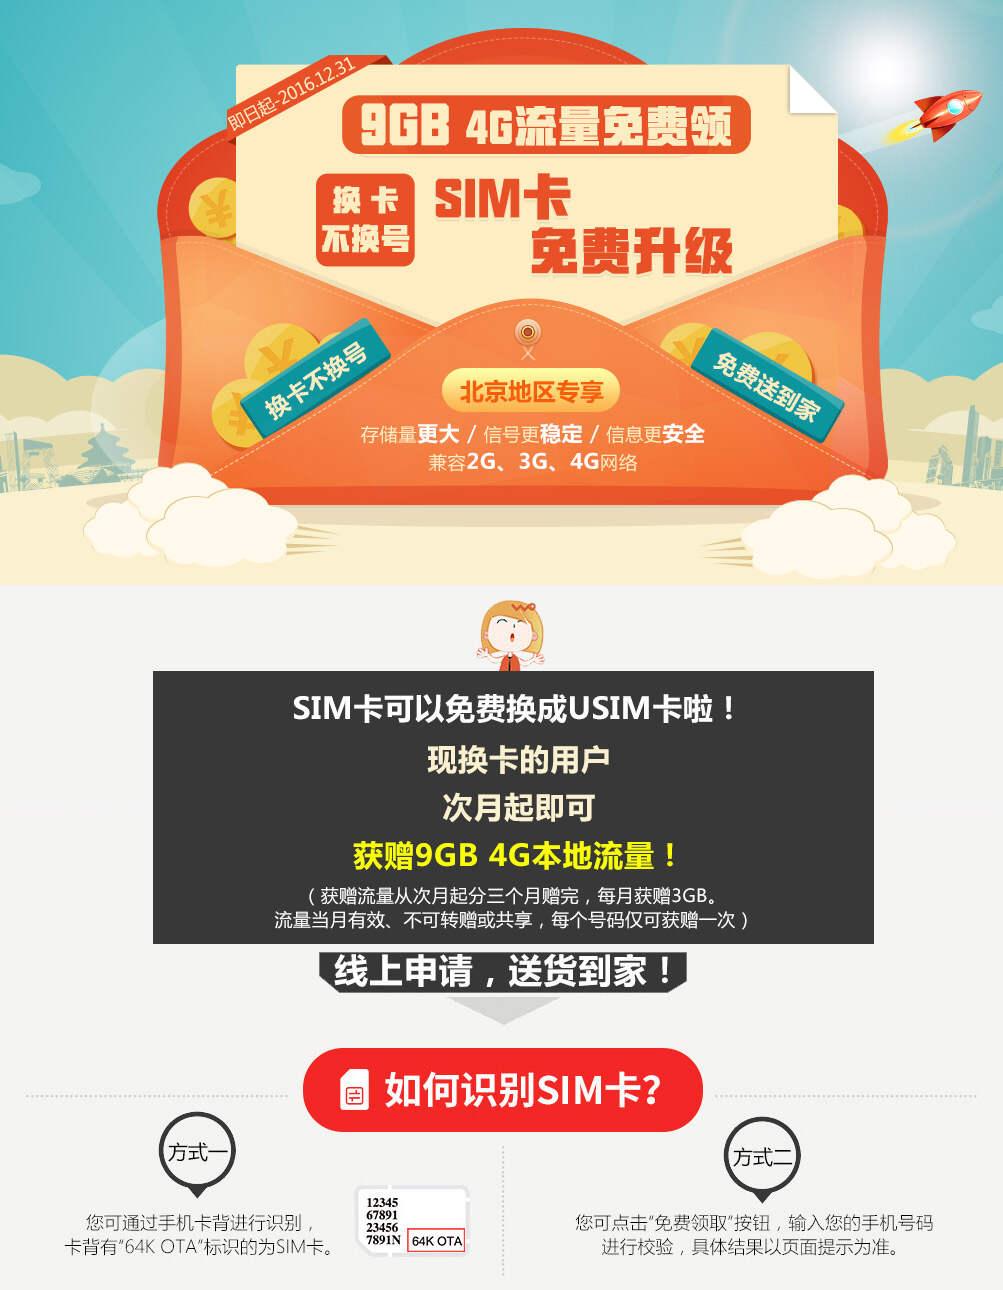 SIM卡用户免费换卡活动